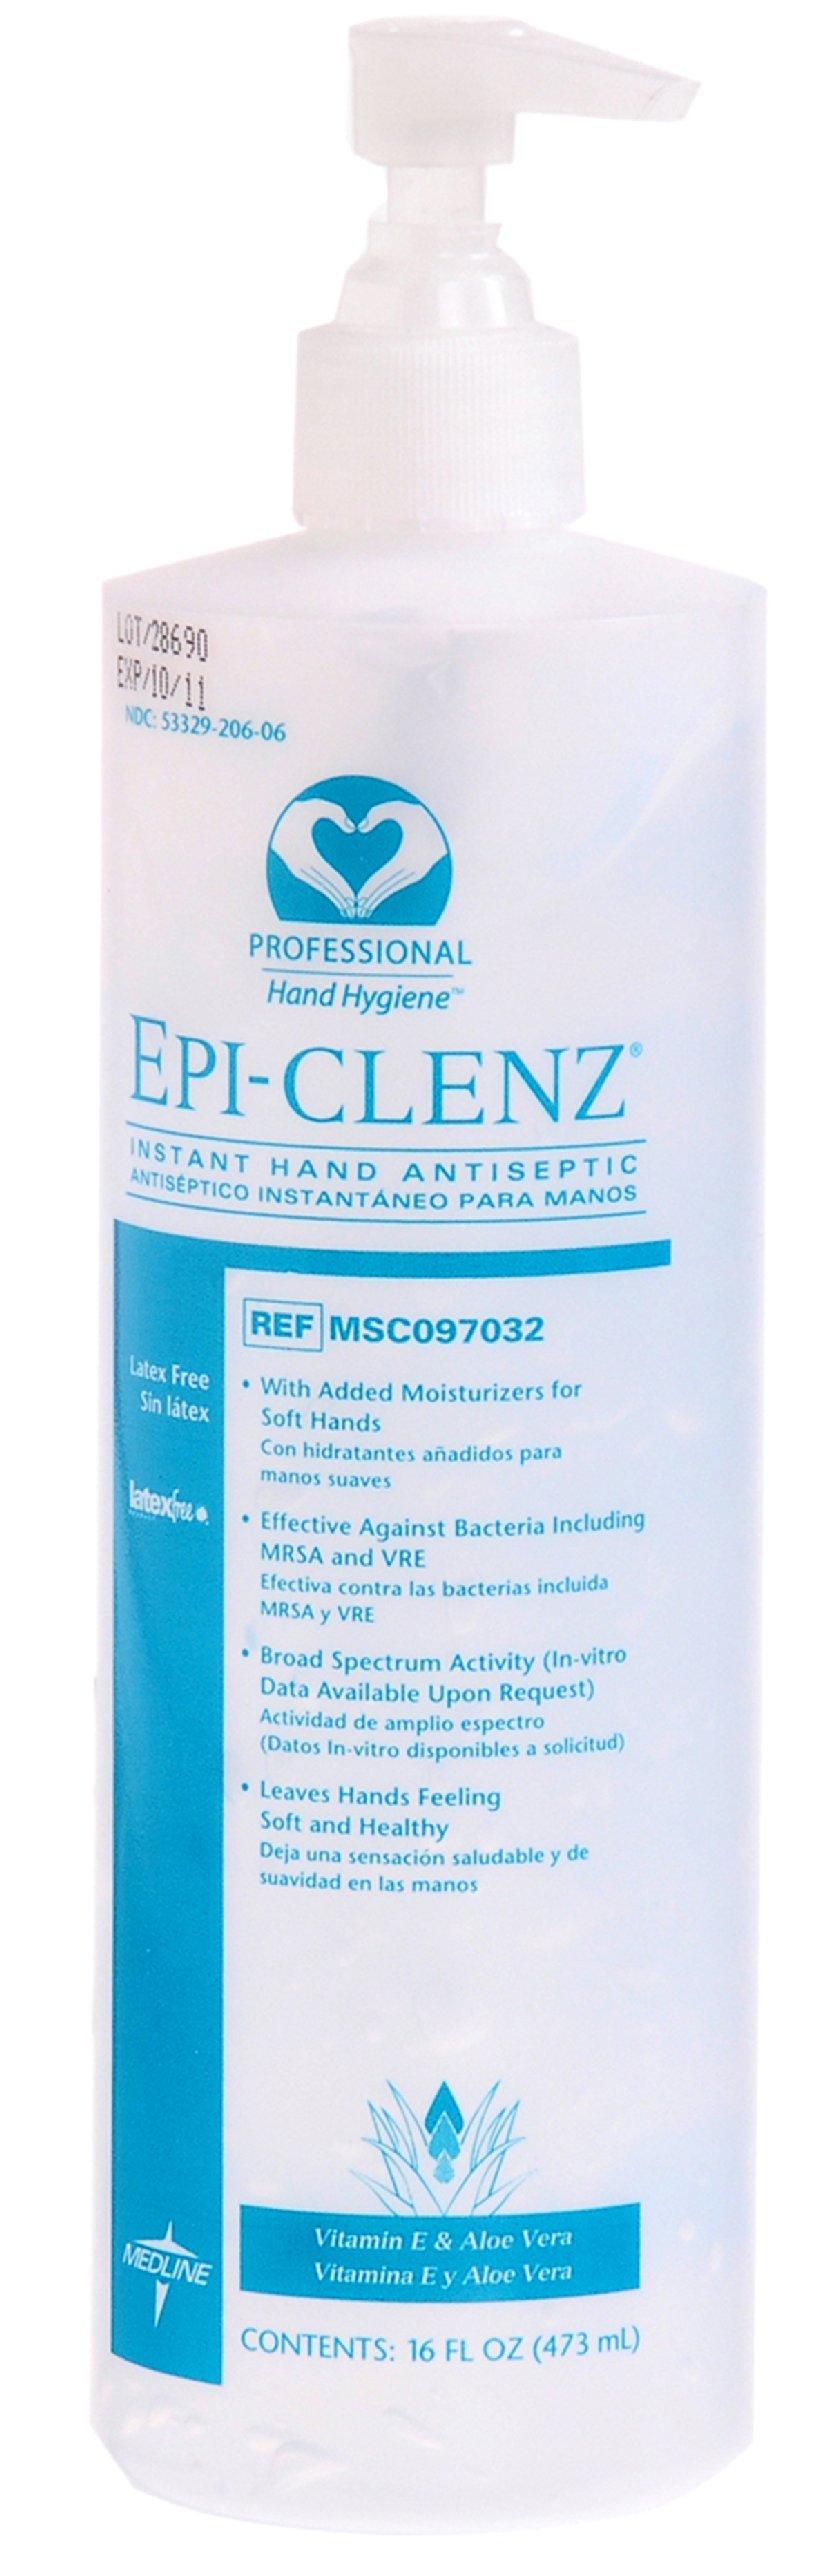 Medline MSC097032 Epi-Clenz Instant Hand Sanitizers, Latex Free, 16 oz, Clear (Pack of 12)